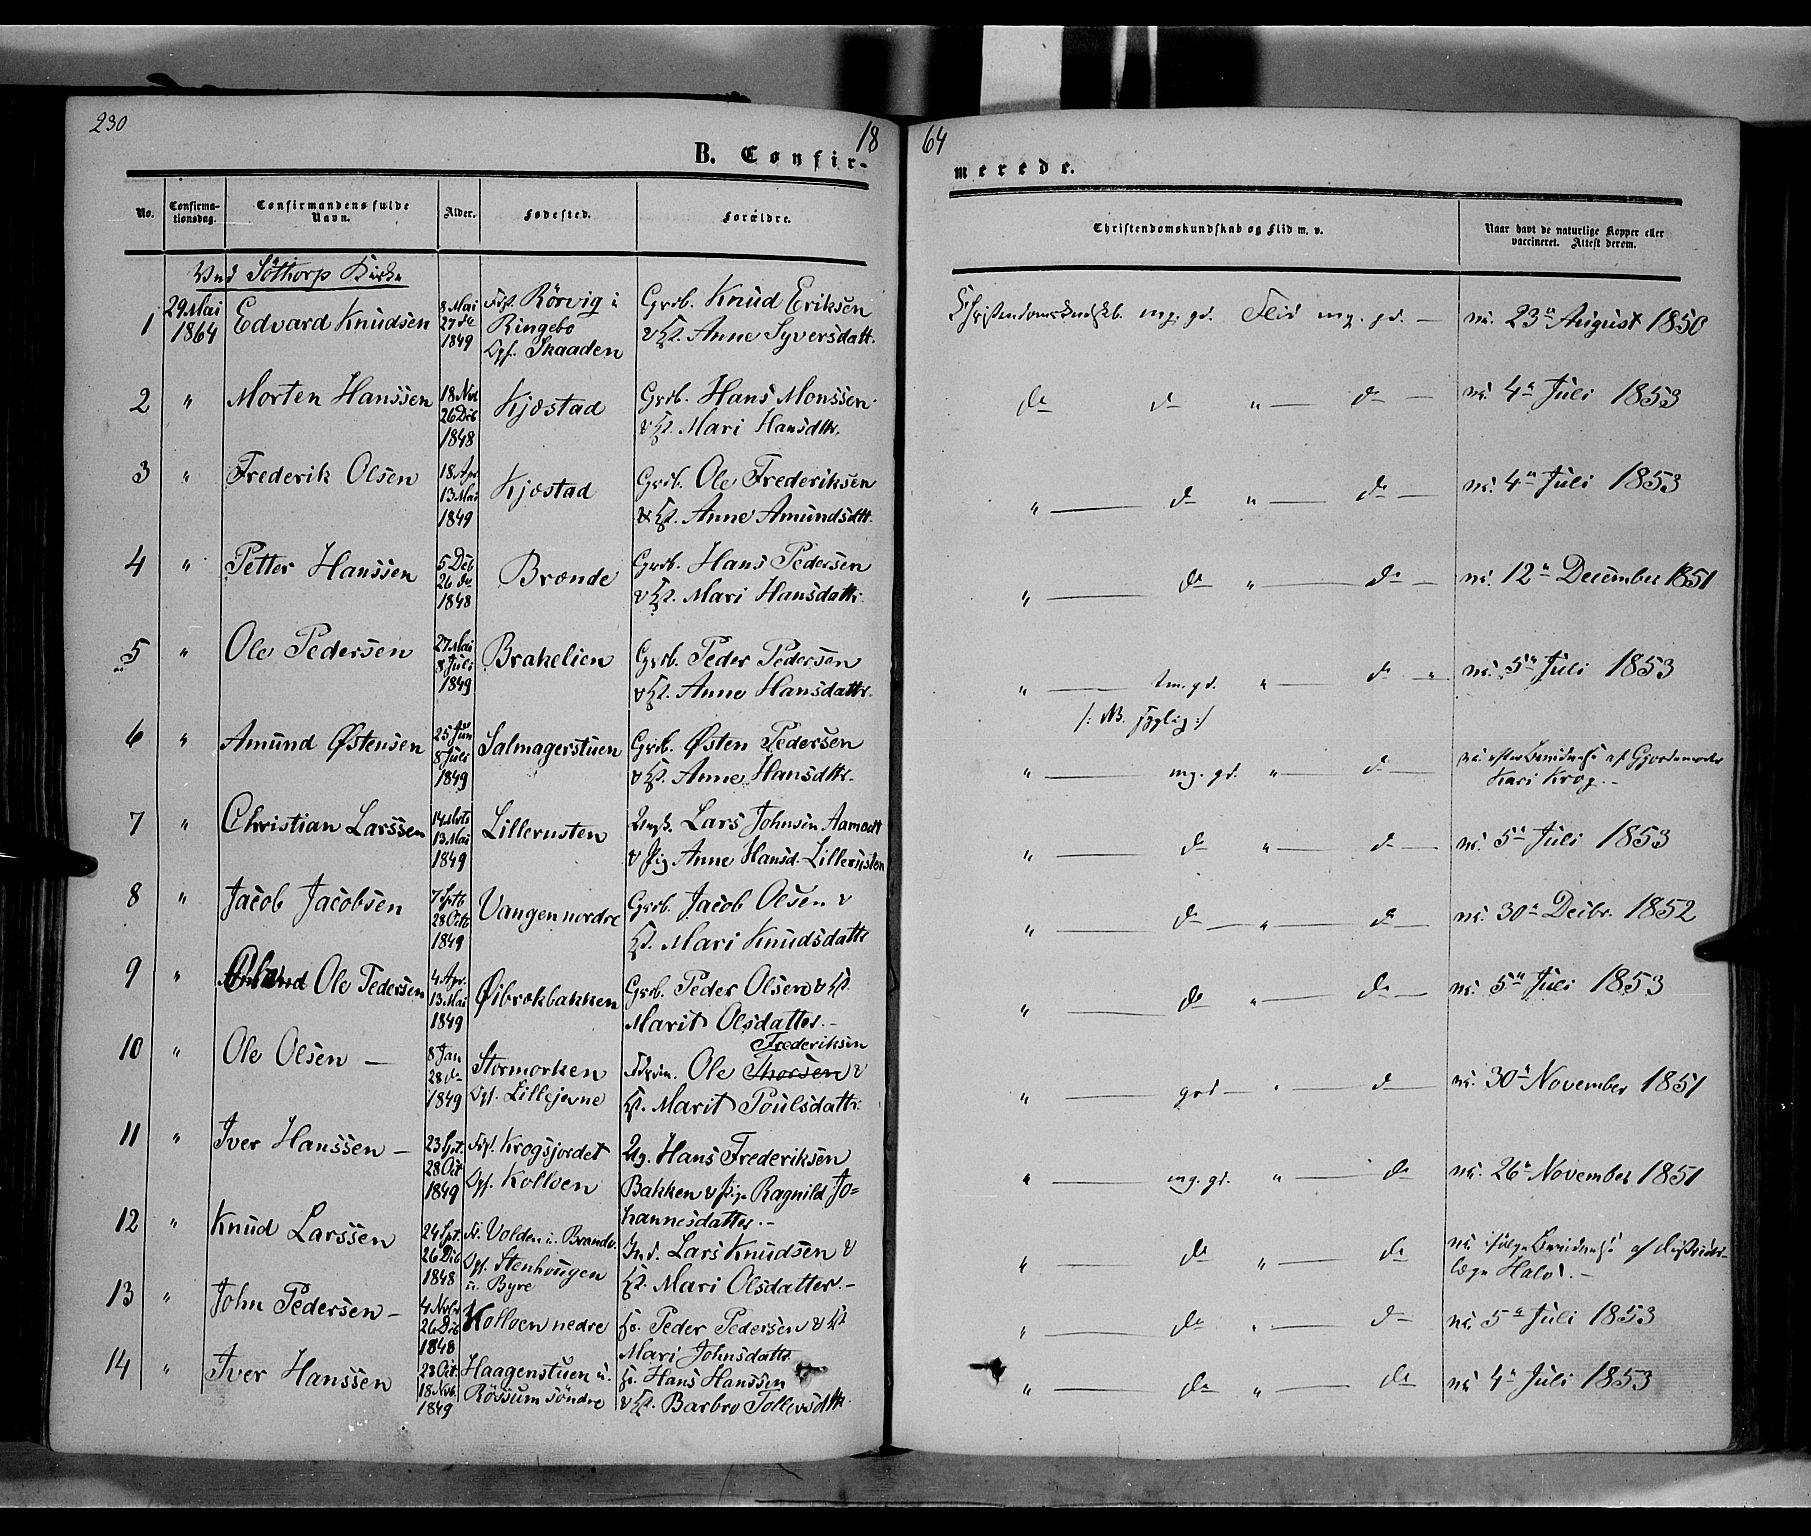 SAH, Nord-Fron prestekontor, Ministerialbok nr. 1, 1851-1864, s. 230